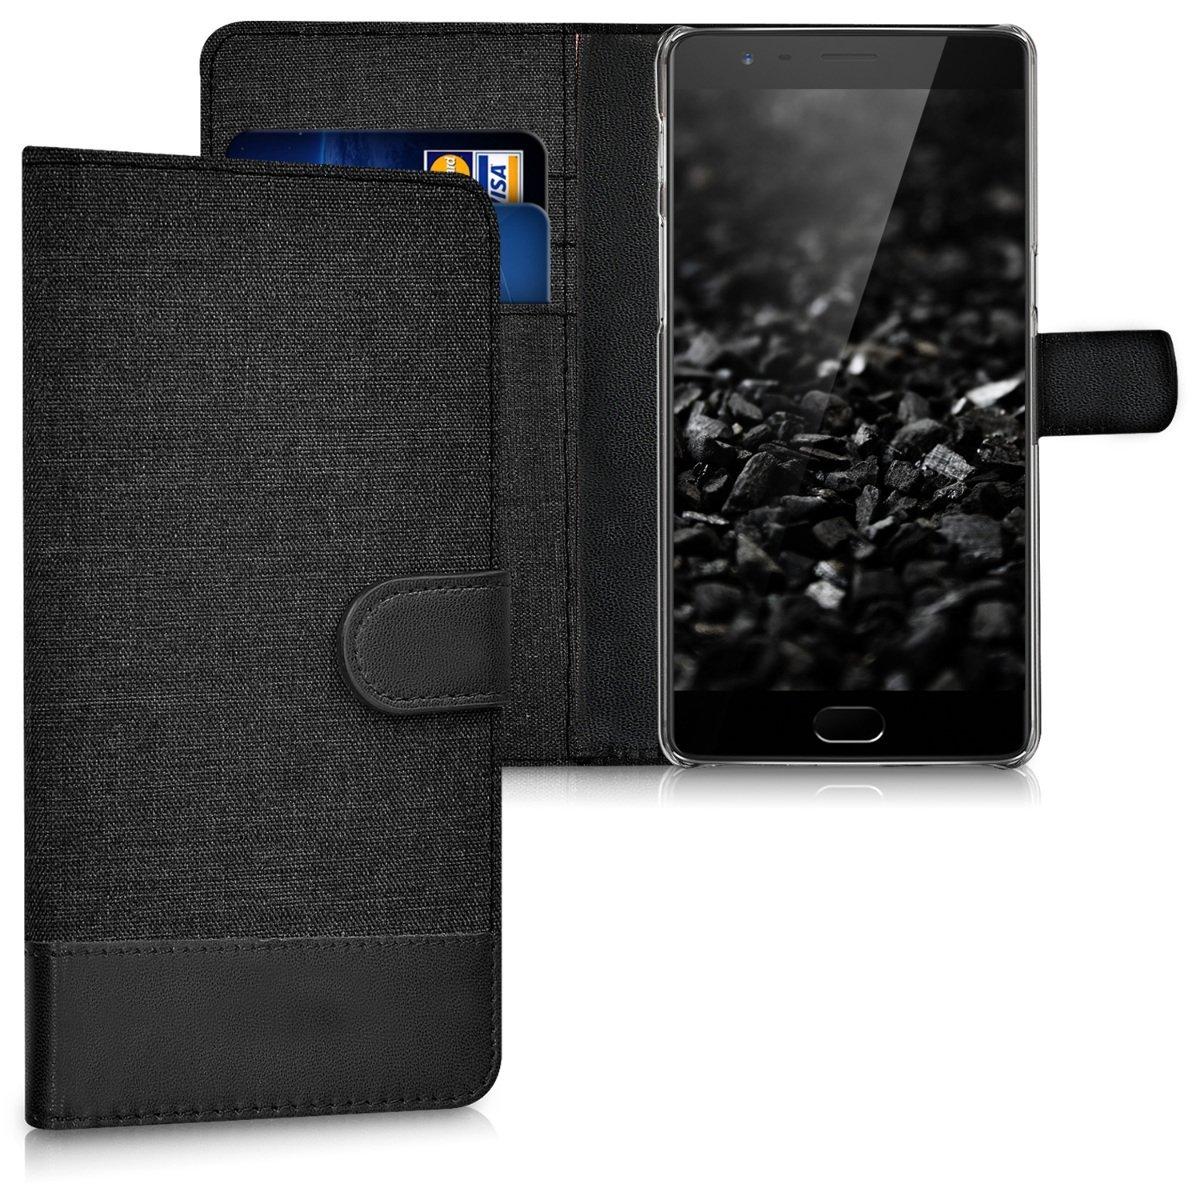 KW Θήκη - Πορτοφόλι OnePlus 3/3T - Anthracite/ Black (38833.19)